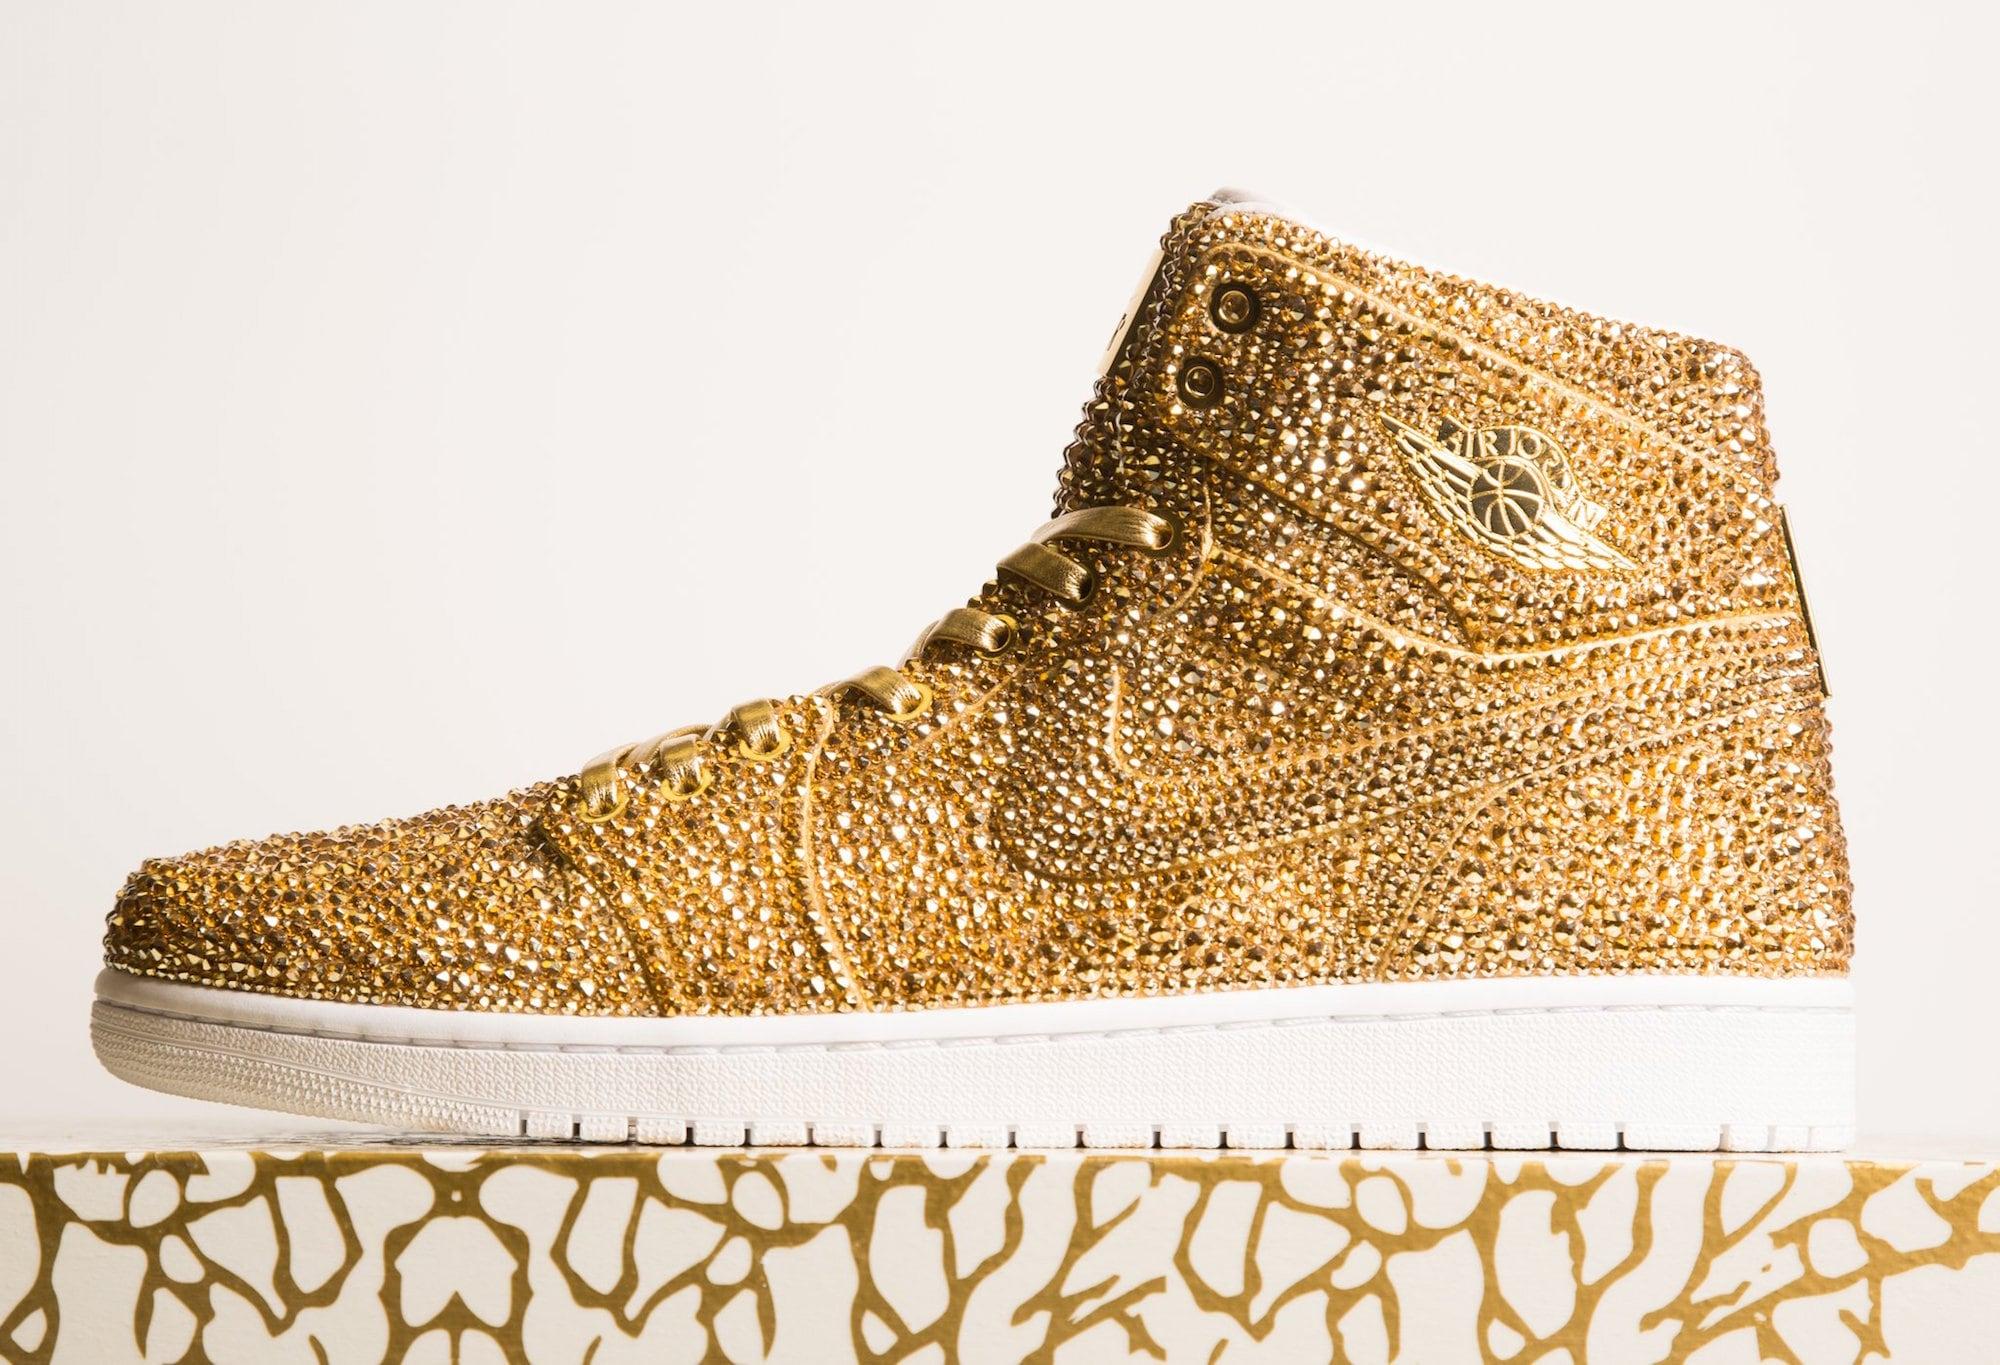 Daniel Jacob verziert Nike Air Jordans mit Swarovski Kristallen 3